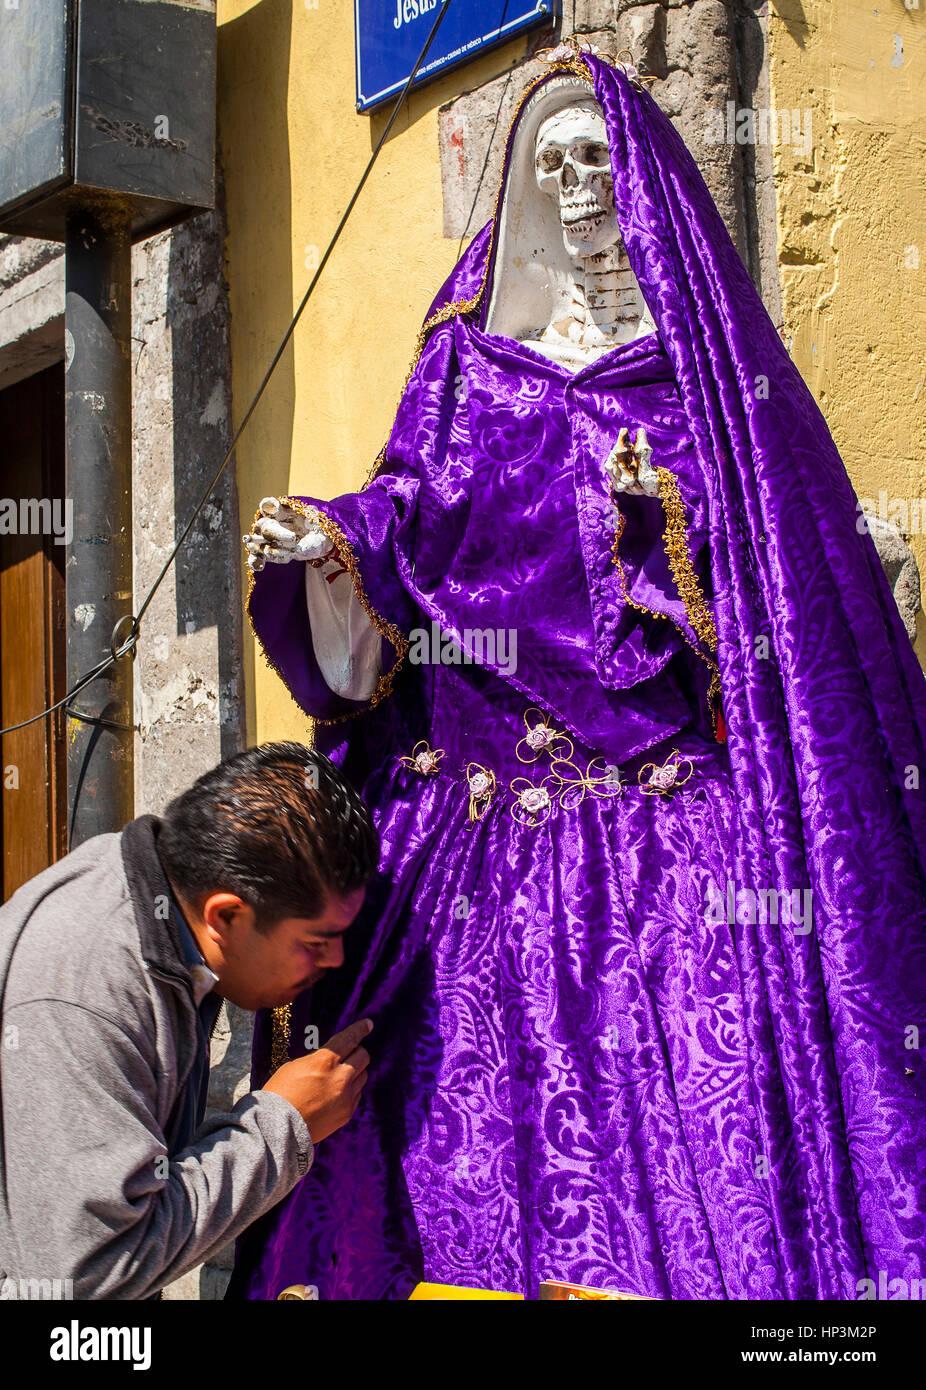 La Santa Muerte Saint Death Emiliano Zapata street at Jesus Maria street Mexico City Mexico & La Santa Muerte Saint Death Emiliano Zapata street at Jesus Maria ...